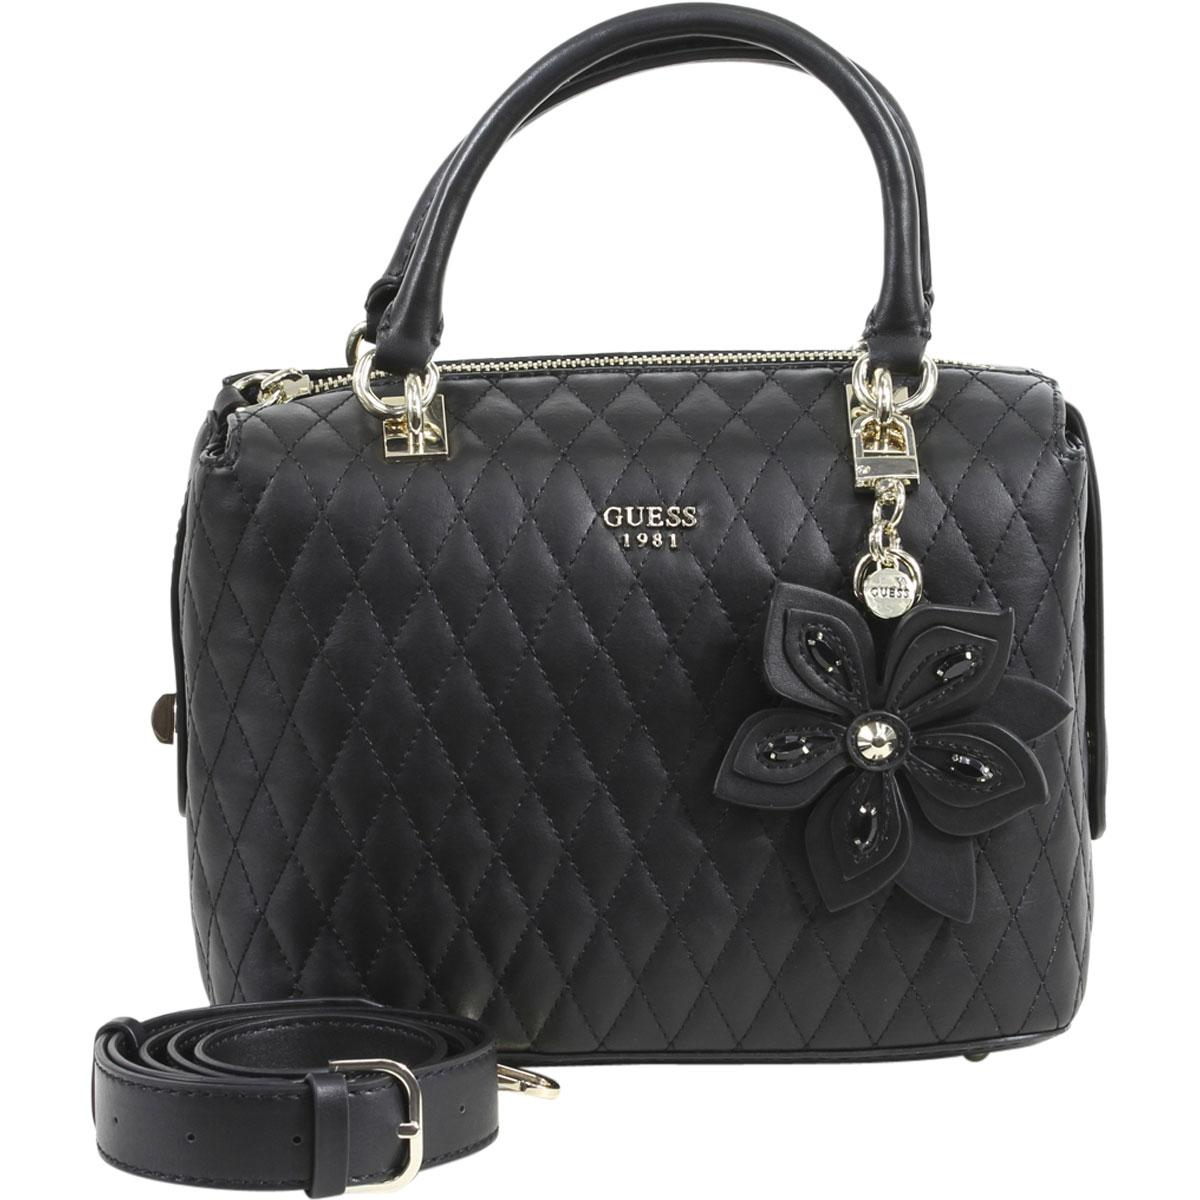 52566005ac Guess Women s Sibyl Metallic Box Satchel Handbag